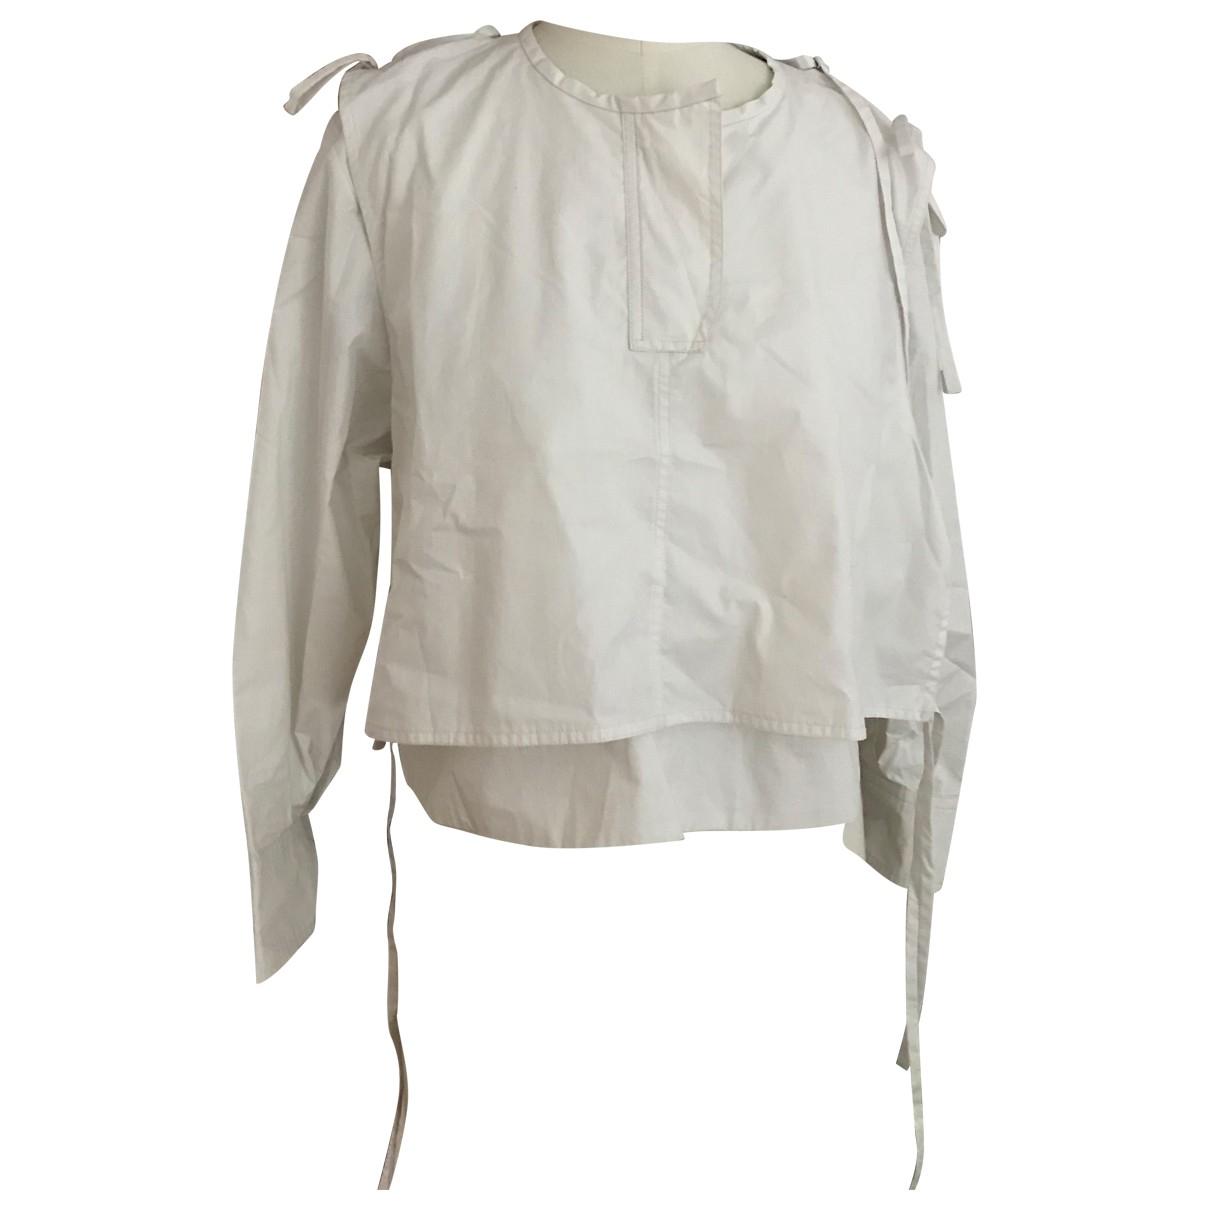 Isabel Marant N White Cotton  top for Women 40 FR